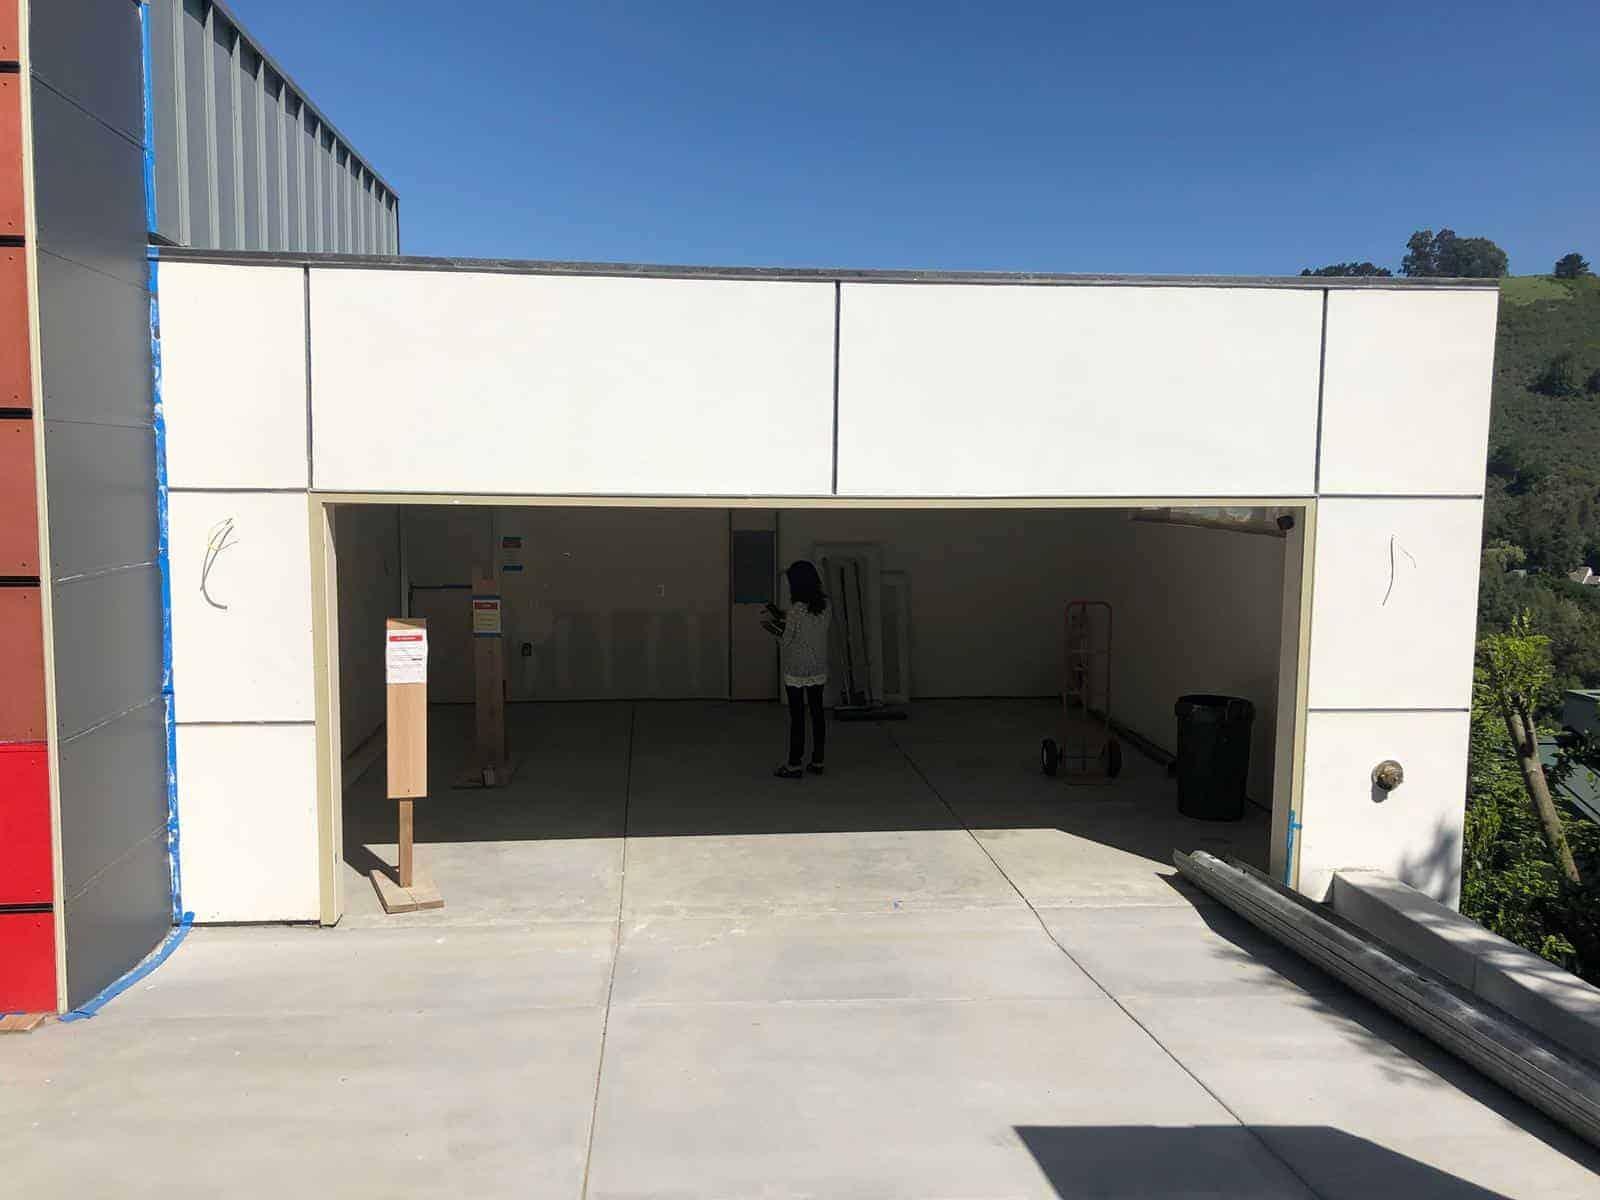 La Presa CA Garage Door Repair & Replacement